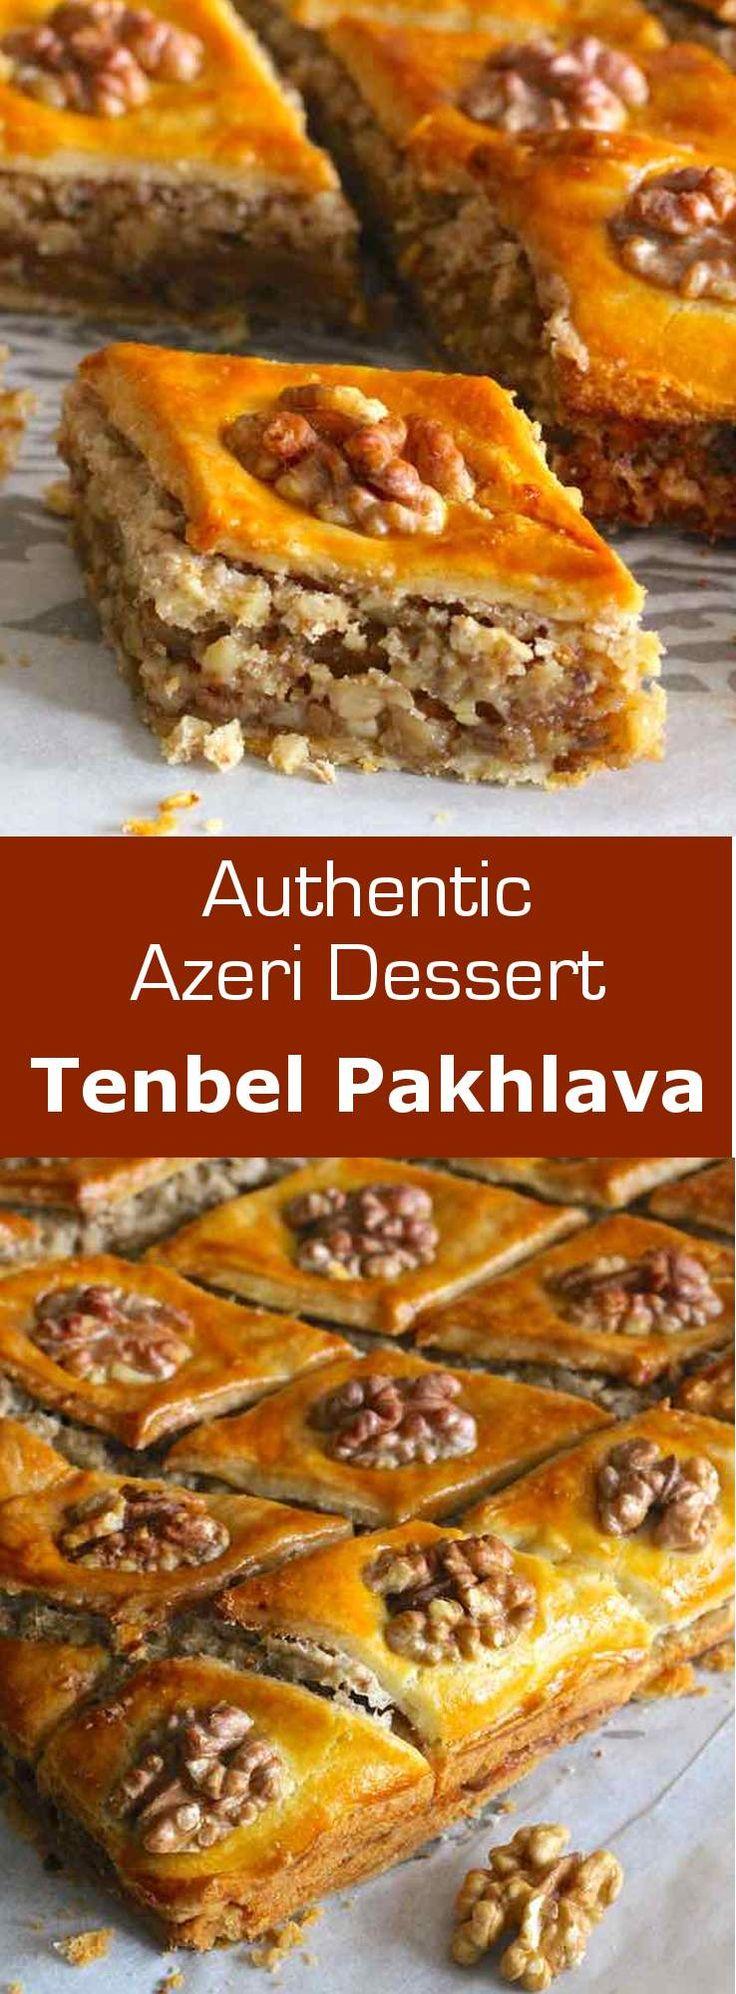 Tenbel pakhlava (lazy baklava) is the recipe of a delicious and easy to make baklava from Azerbaijan.